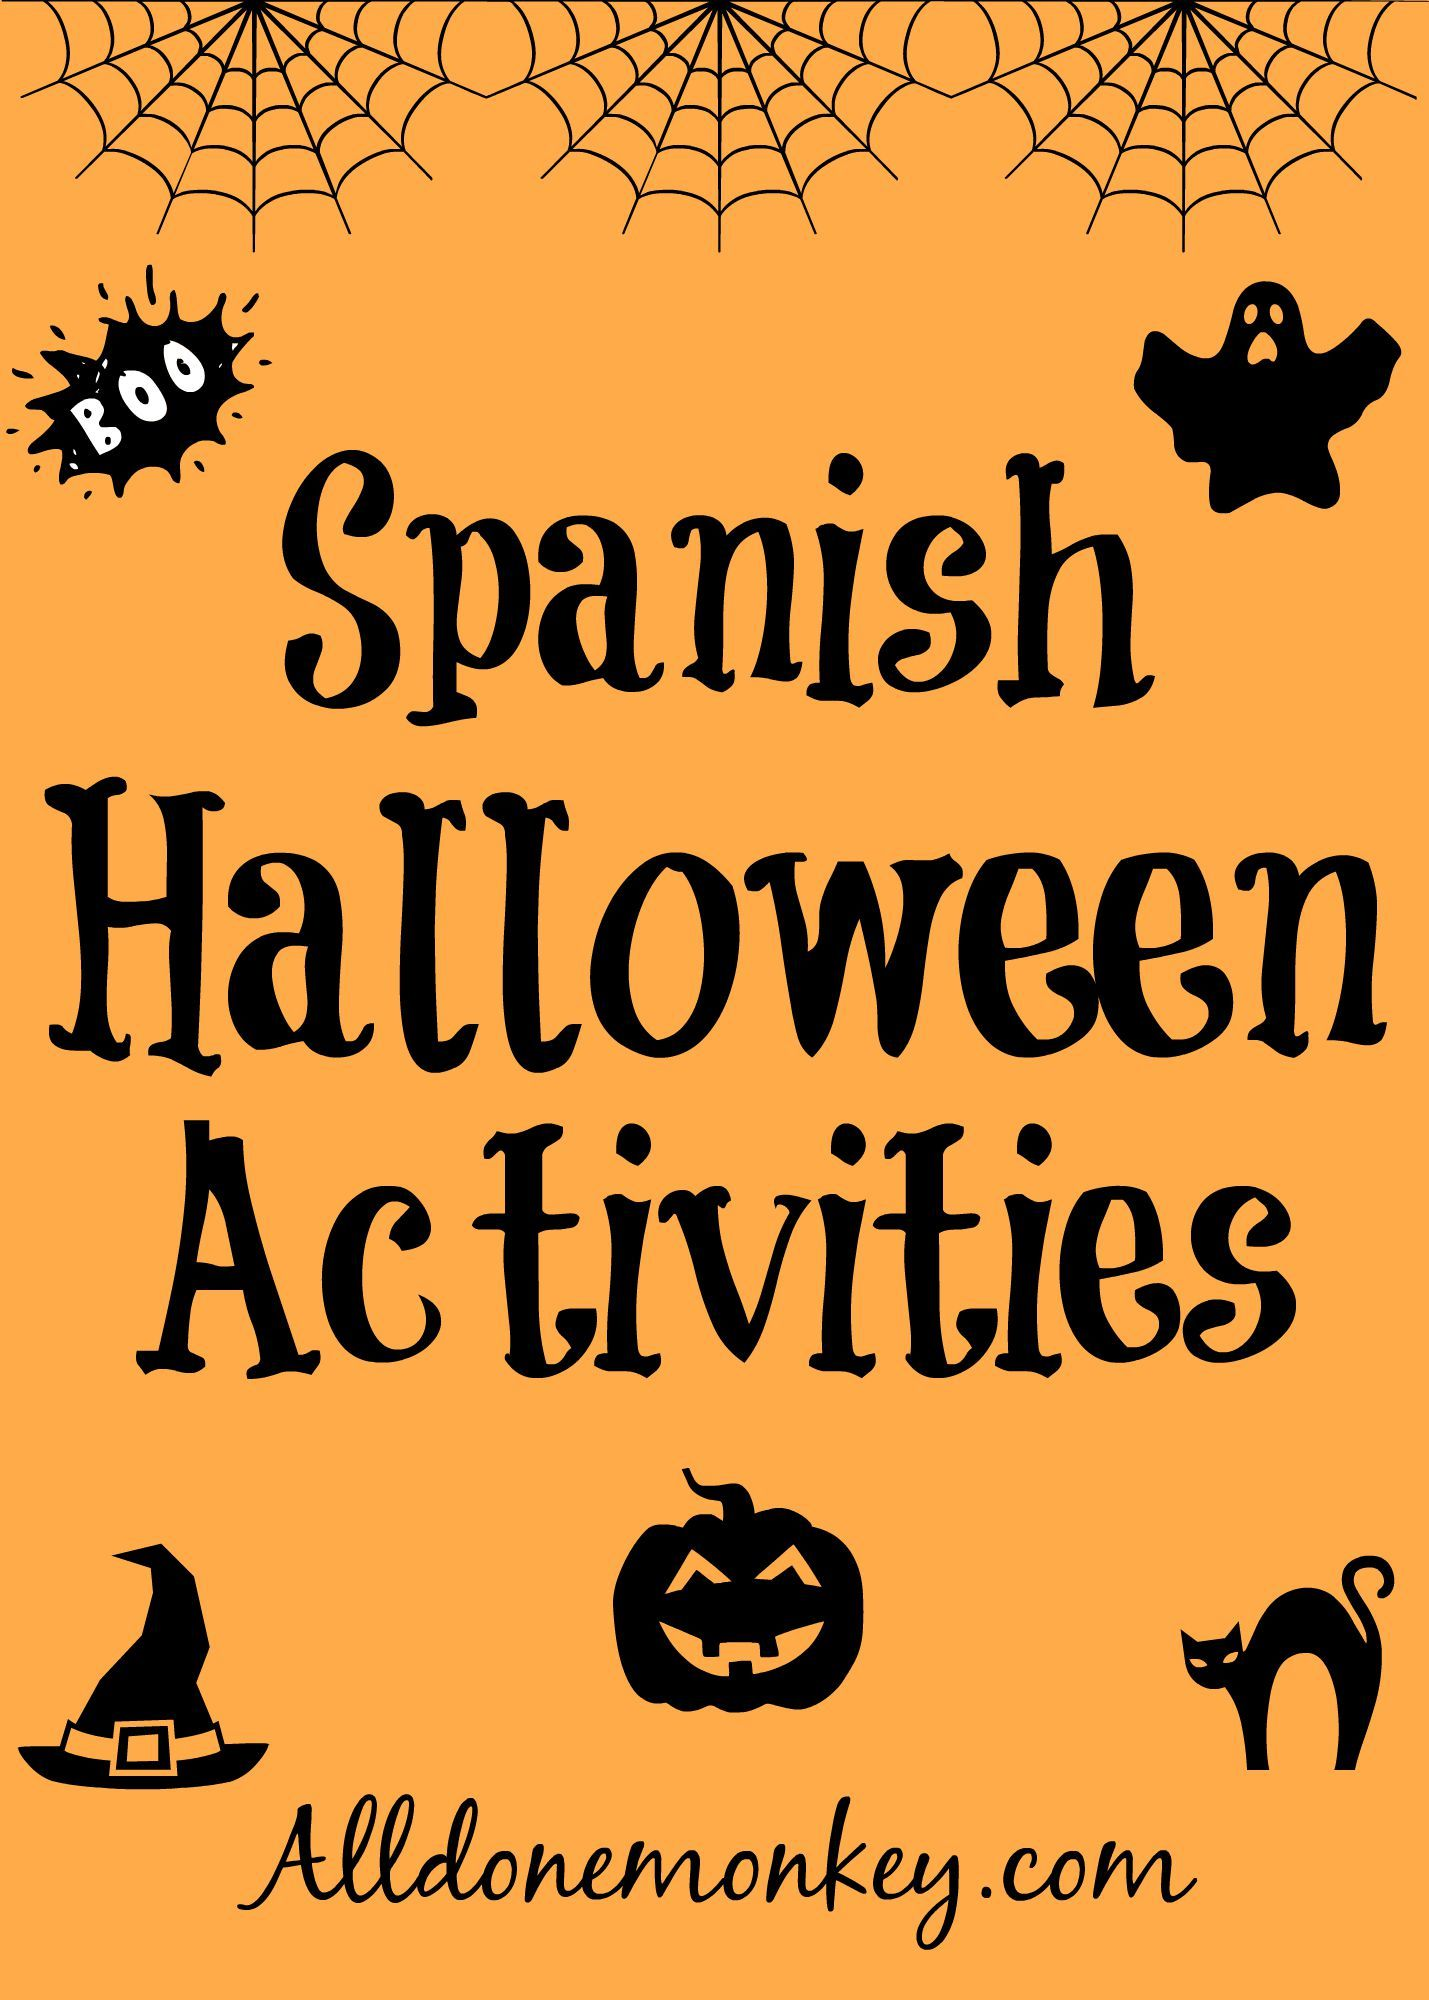 Spanish Halloween Activities   Halloween fun, Spanish and Activities